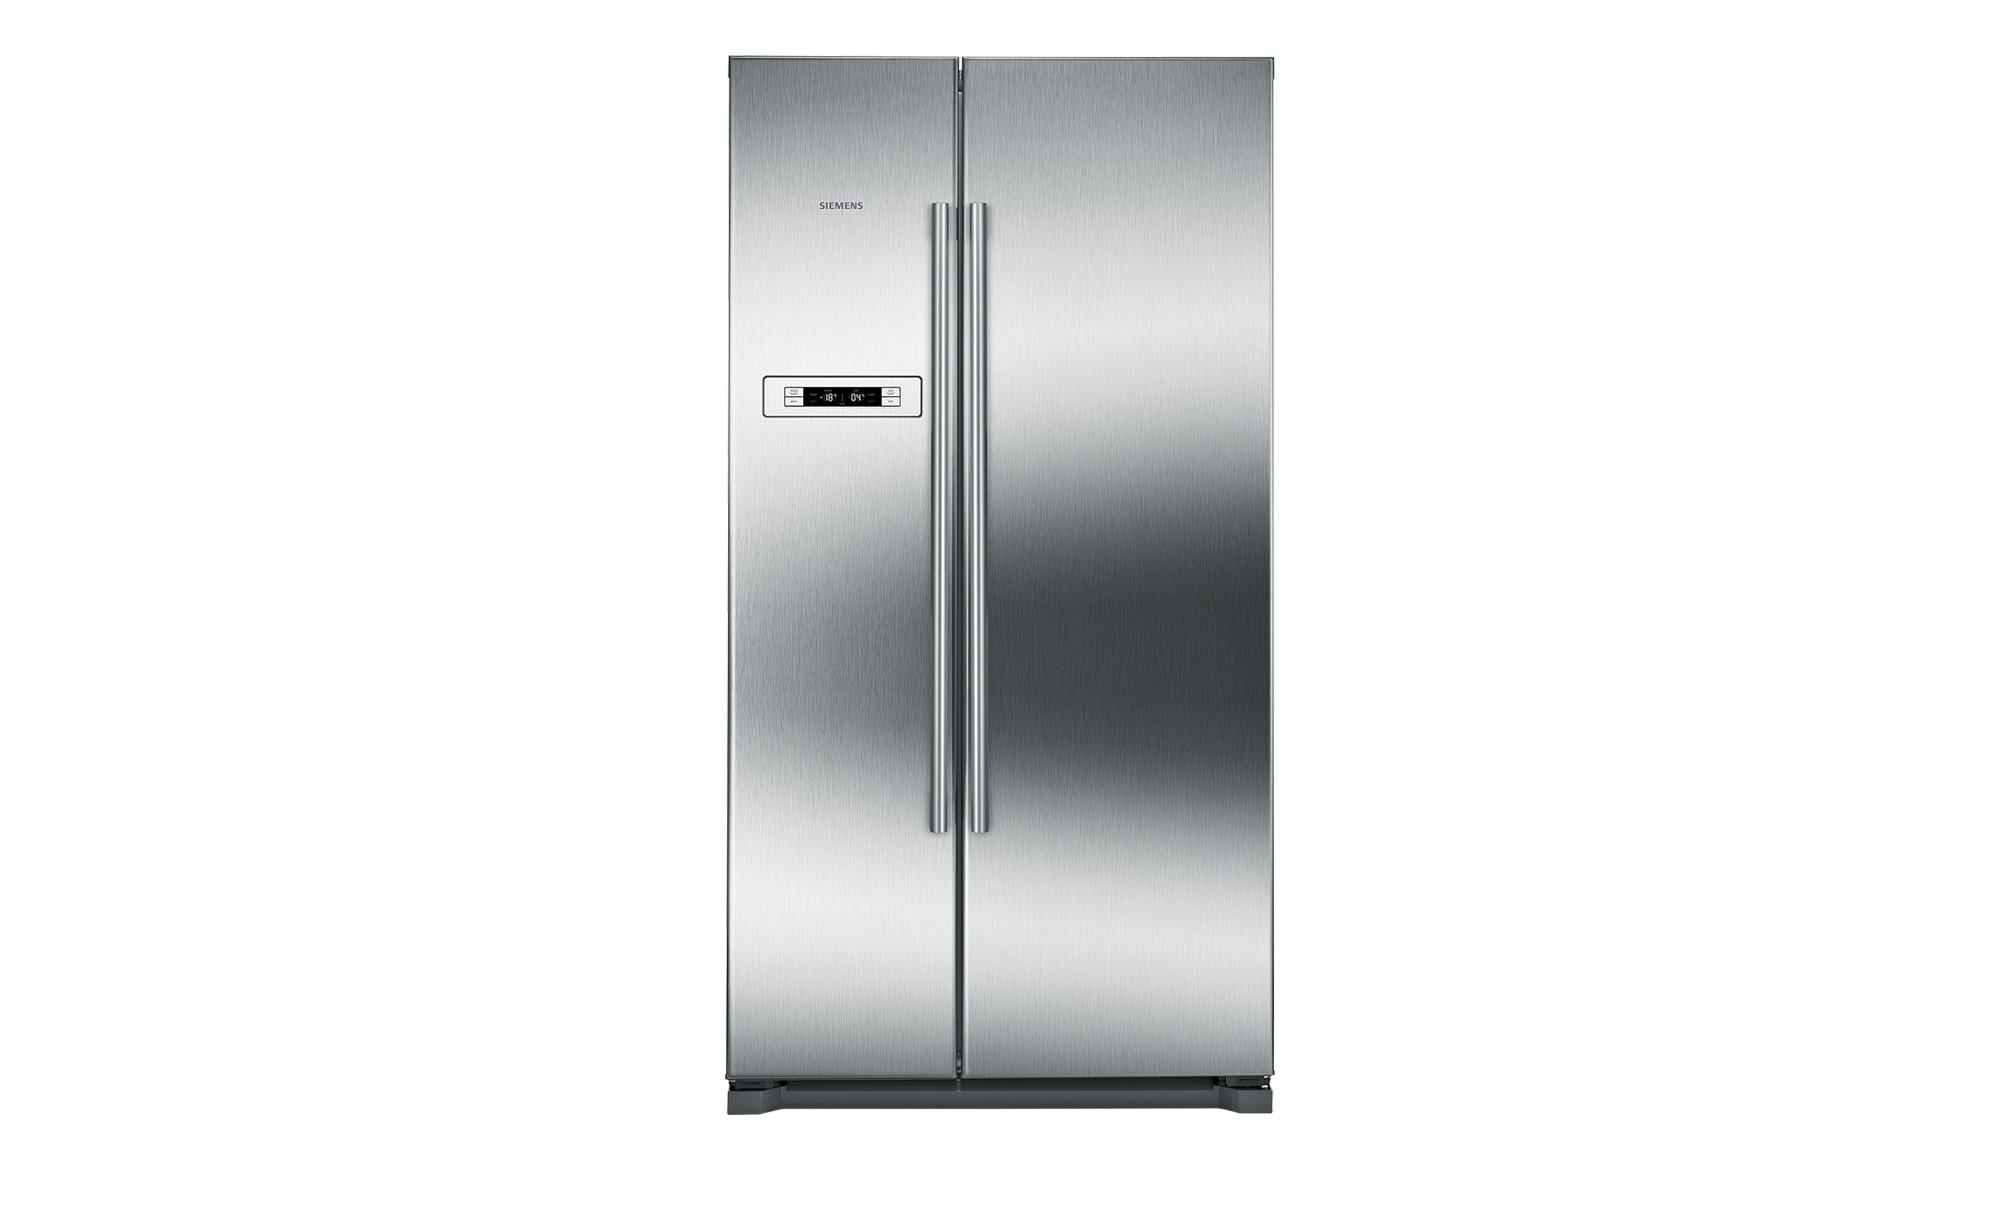 Siemens Kühlschrank Edelstahl : Siemens side by side ka 90 nvi 30 bei möbel kraft online kaufen